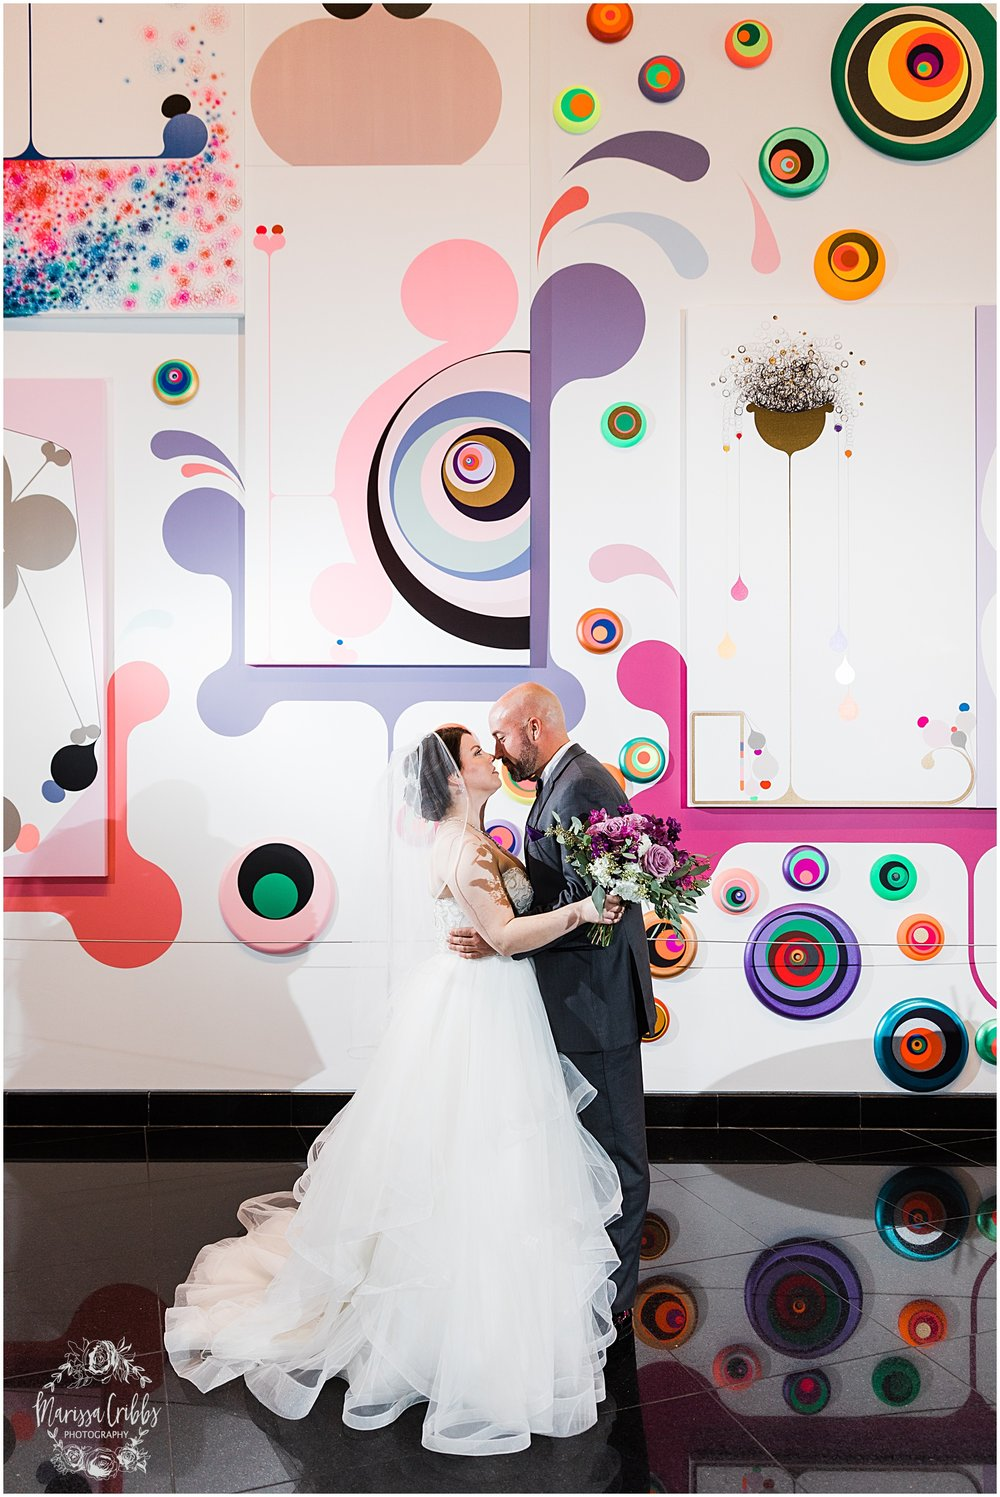 LAURA & DAN MARRIED | NELSON ATKINS MUSEUM | MARISSA CRIBBS PHOTOGRAPHY_7024.jpg